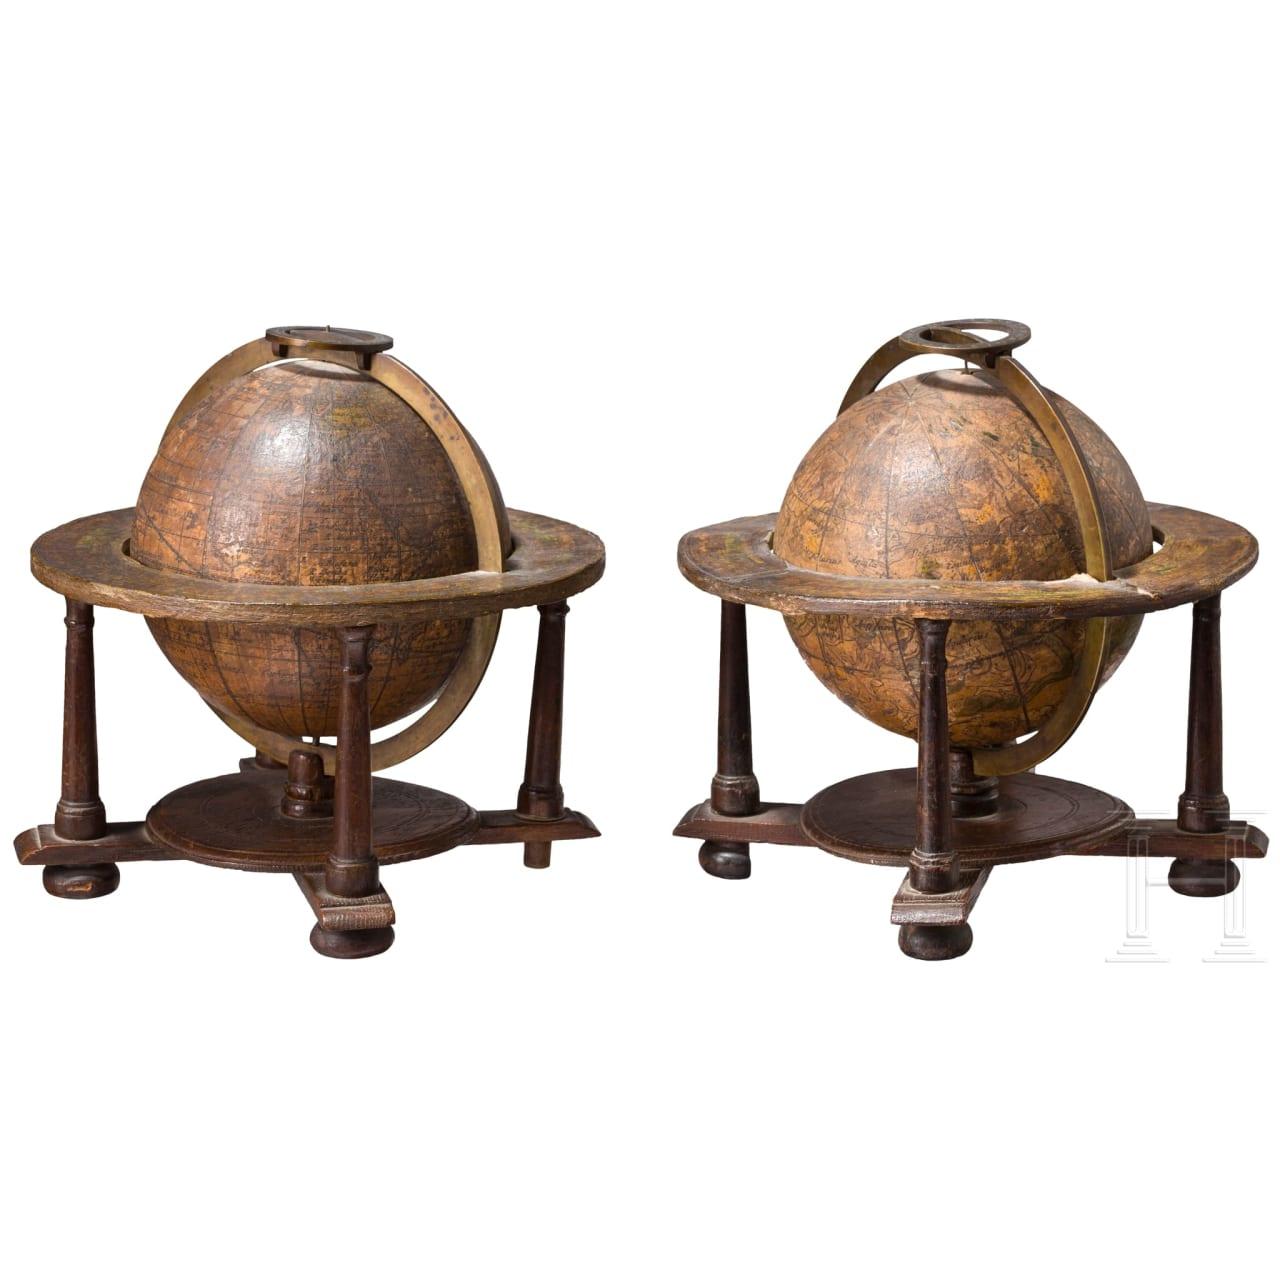 A pair of miniature globes, Johann Gabriel Doppelmayr, Nuremberg, dated 1736